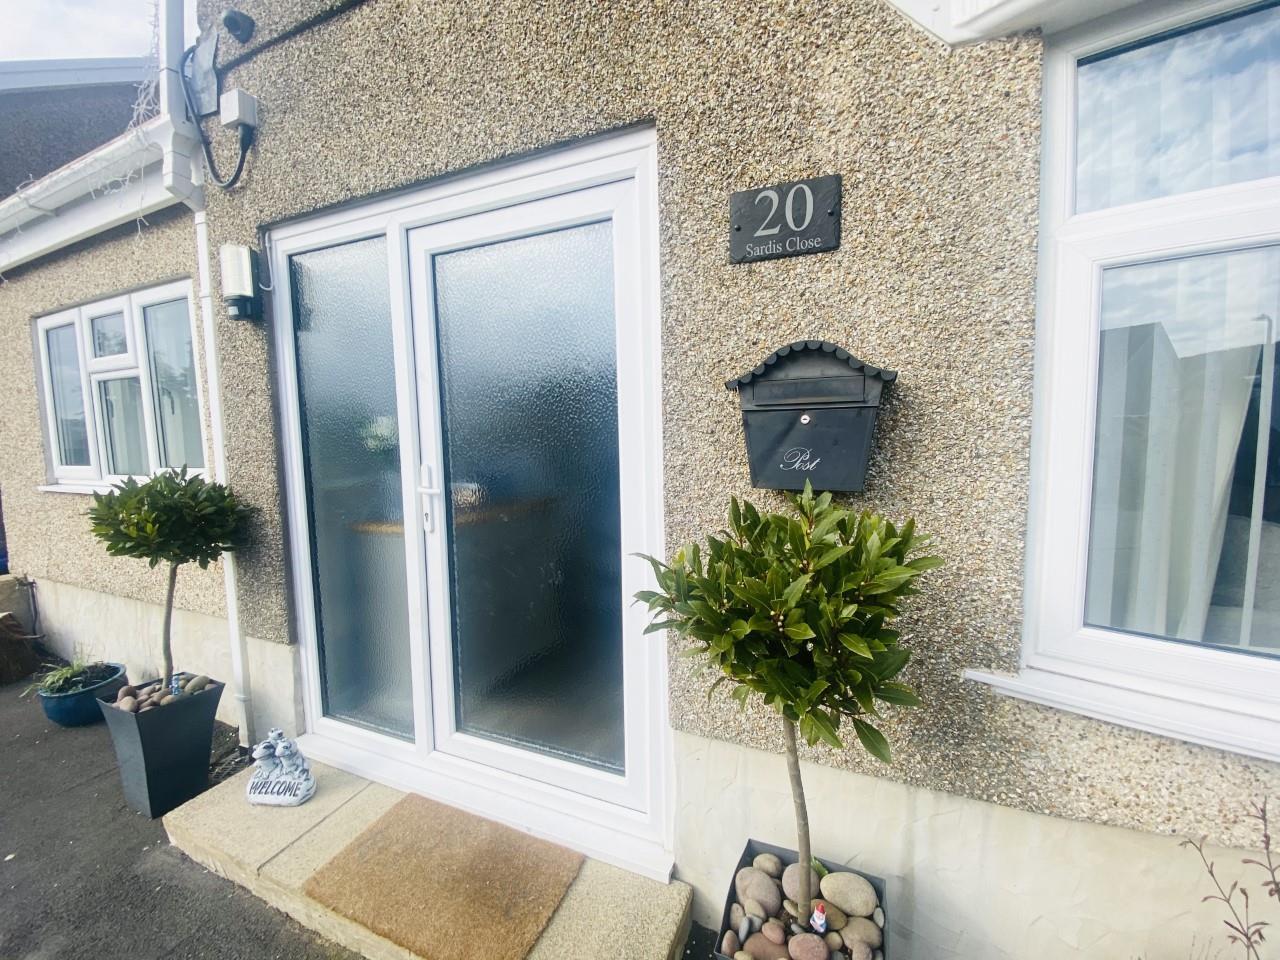 Sardis Close, Waunarlwydd, Swansea, SA5 4RZ